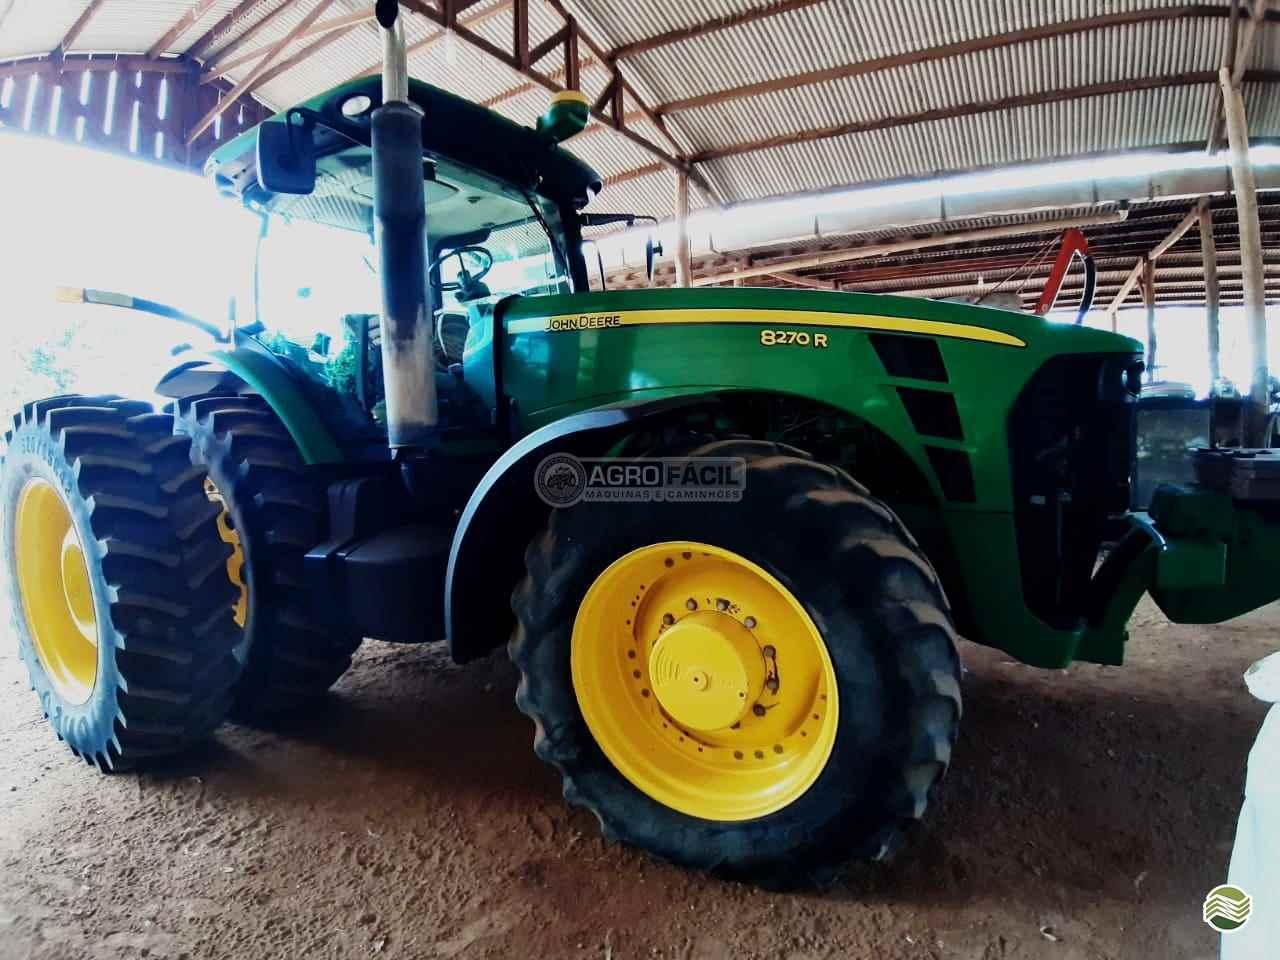 JOHN DEERE 8270 de Agro Fácil Máquinas - PRIMAVERA DO LESTE/MT